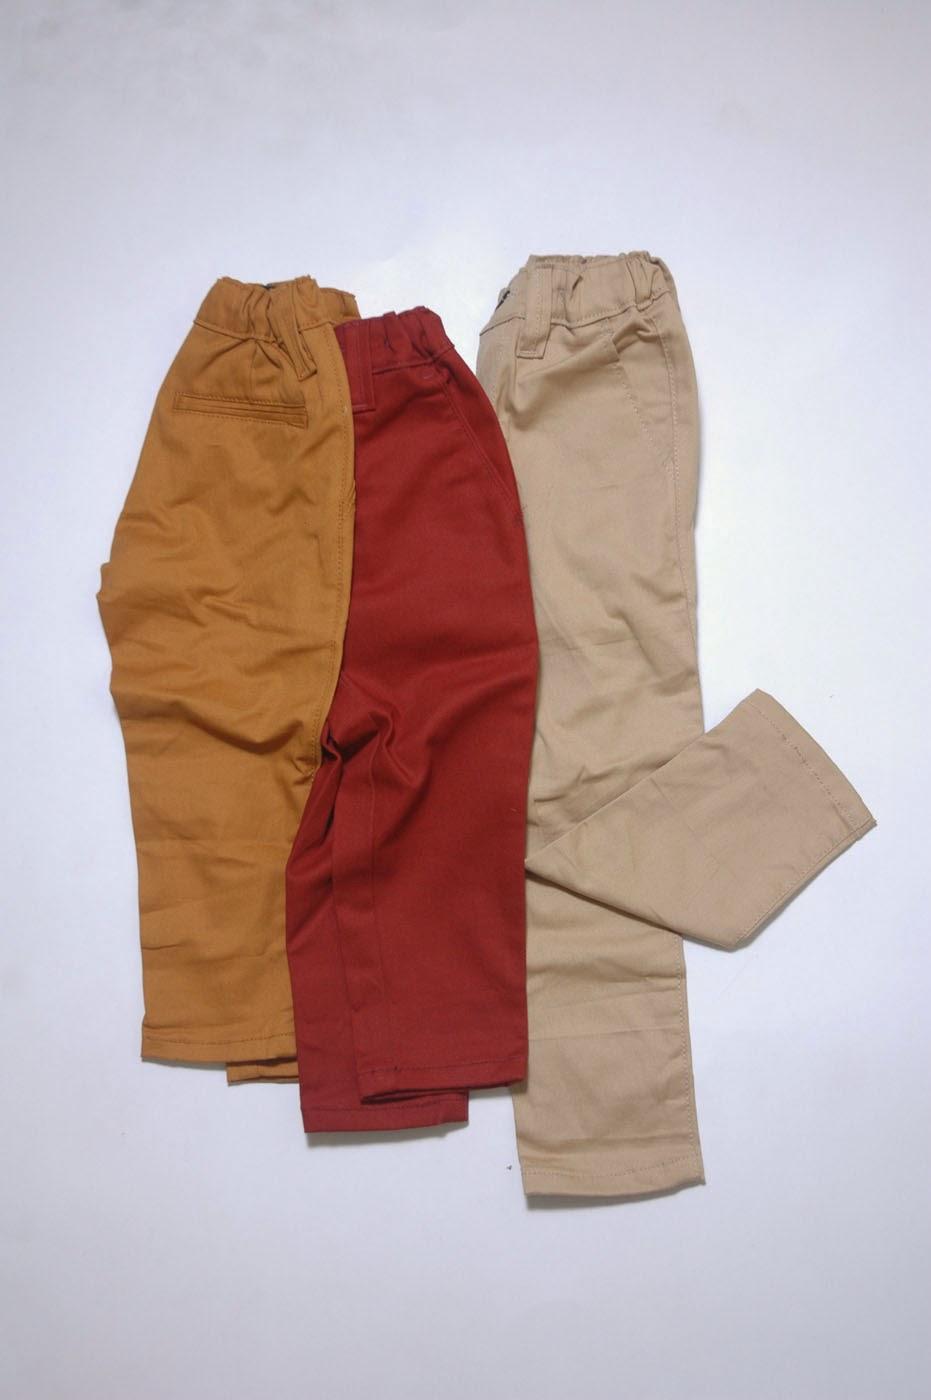 Jual Celana Chino Anak Laki Laki dan Perempuan Murah